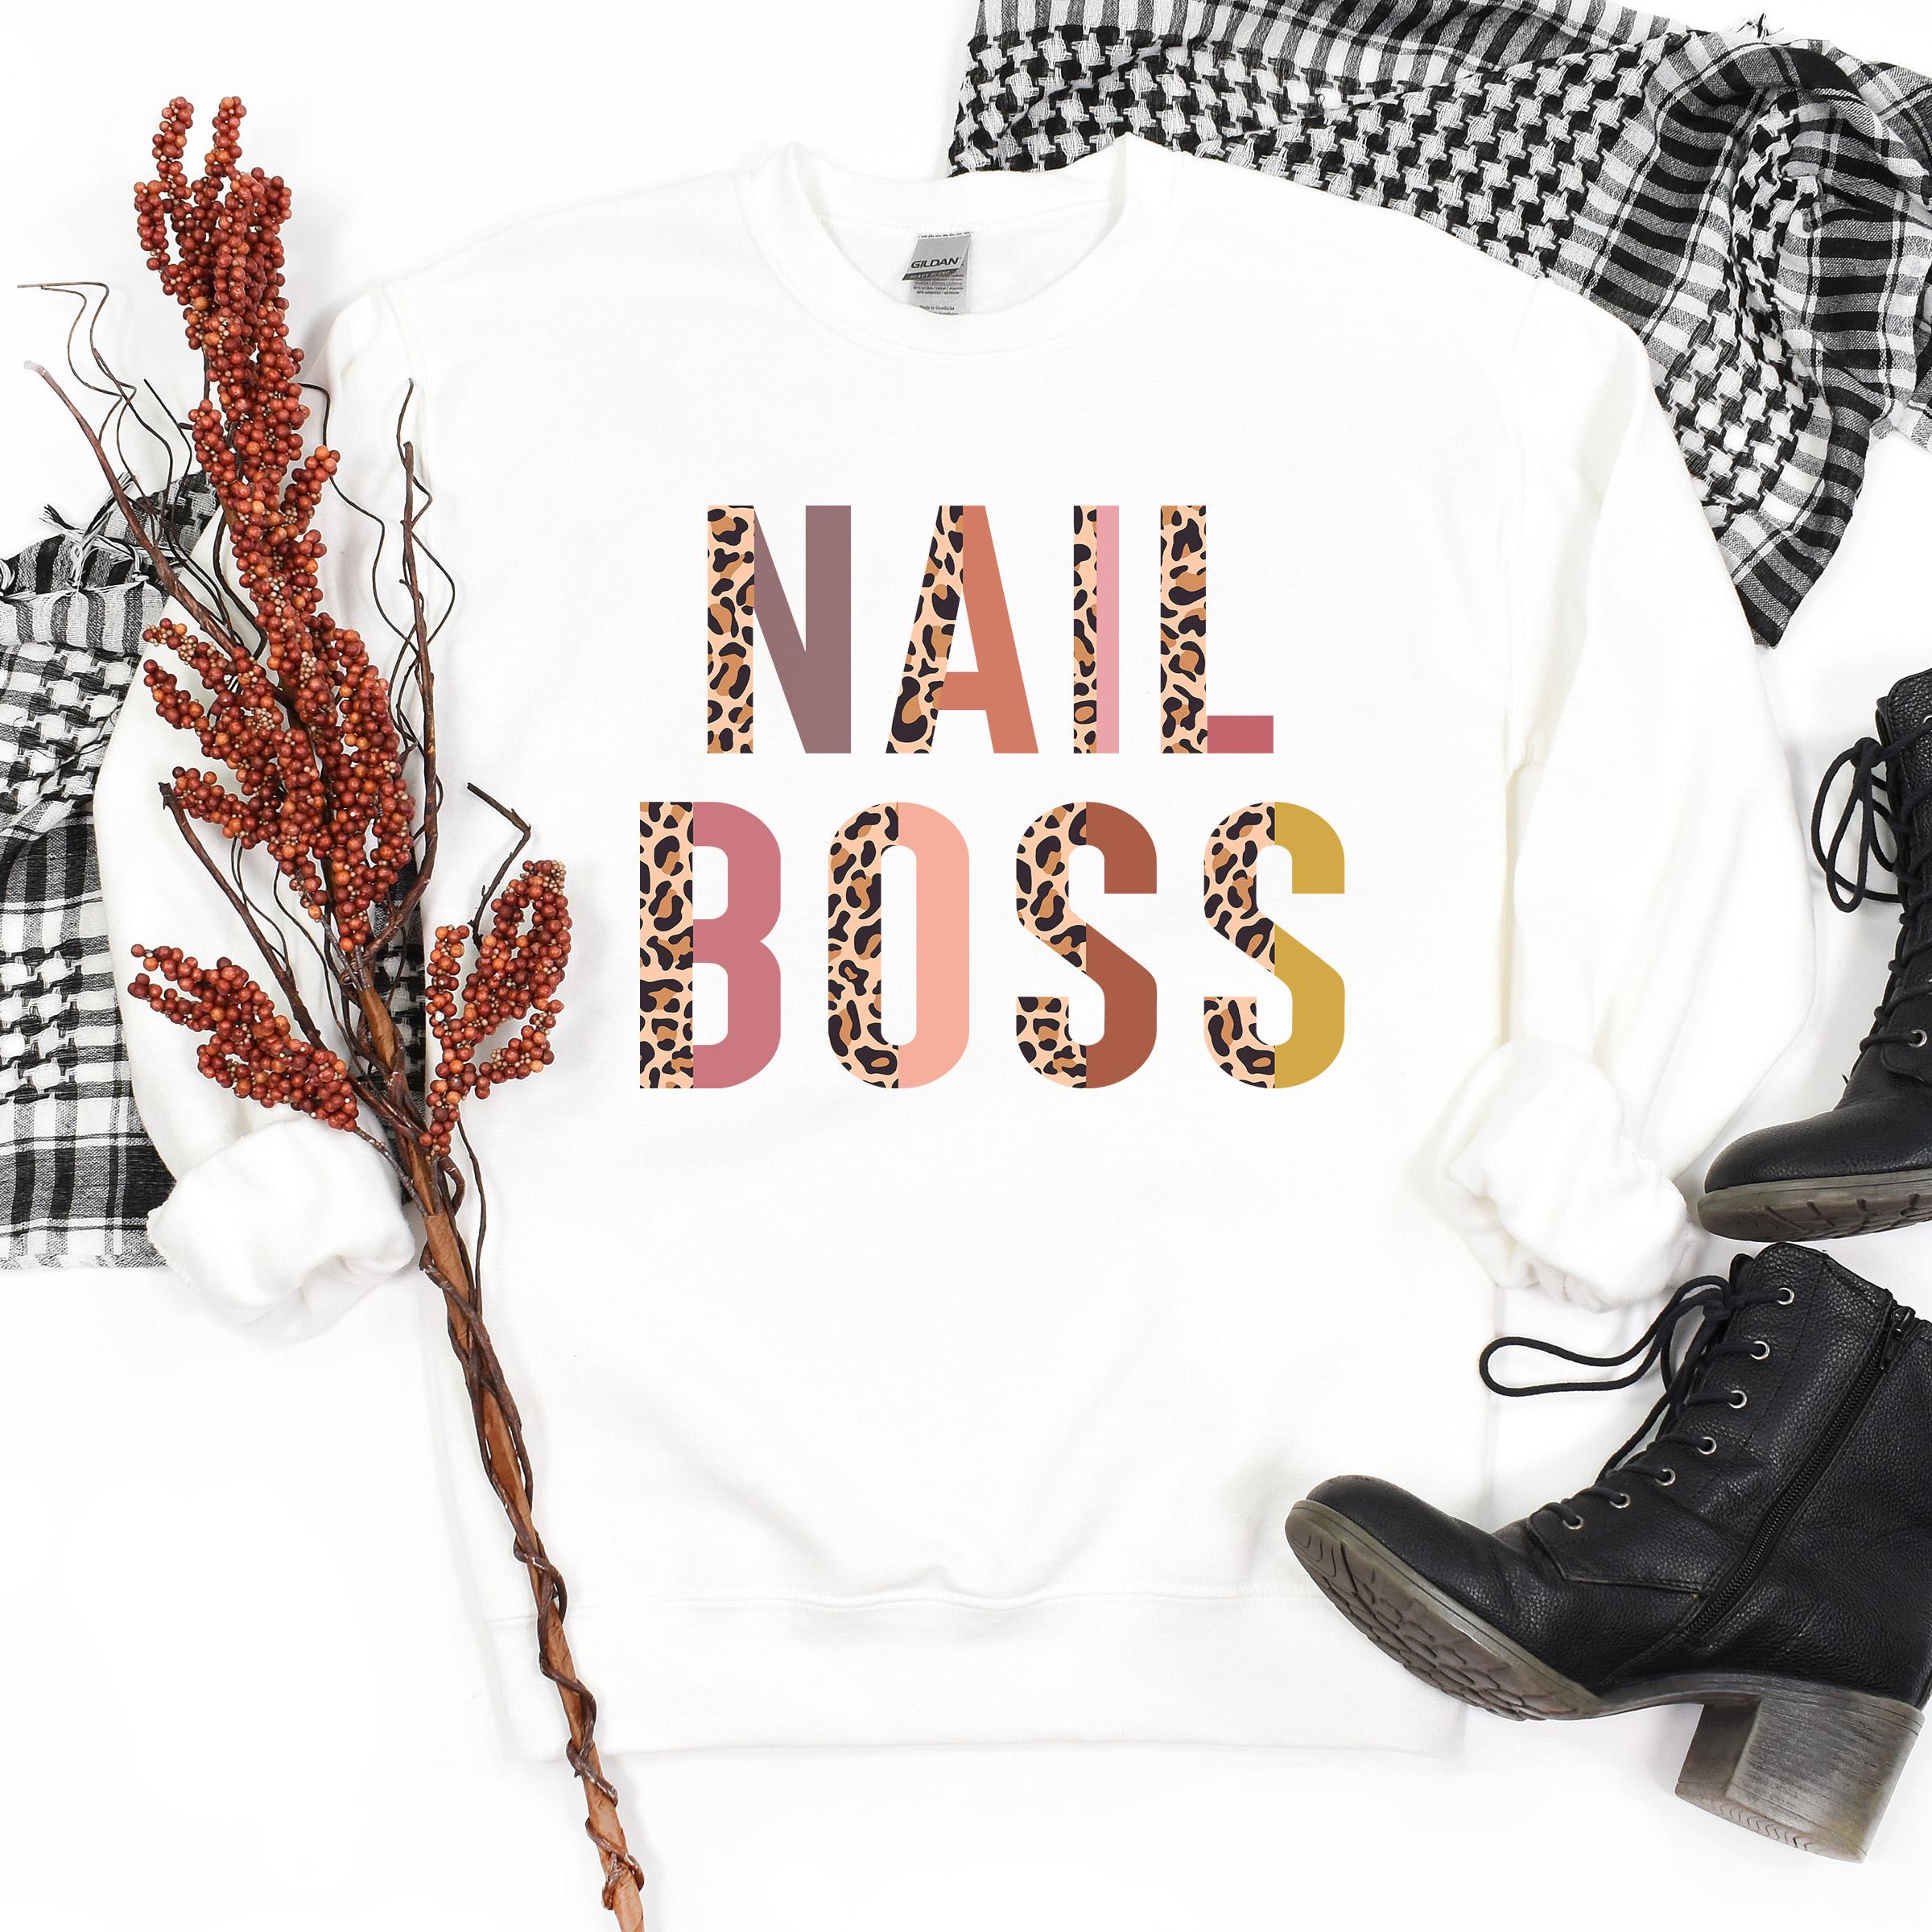 Nail Boss Sweatshirt   Nail Technician   Cosmetologist   Nail Tech Gifts   Nail Queen   Manicure   Pedicure   Unisex Crewneck Sweatshirt